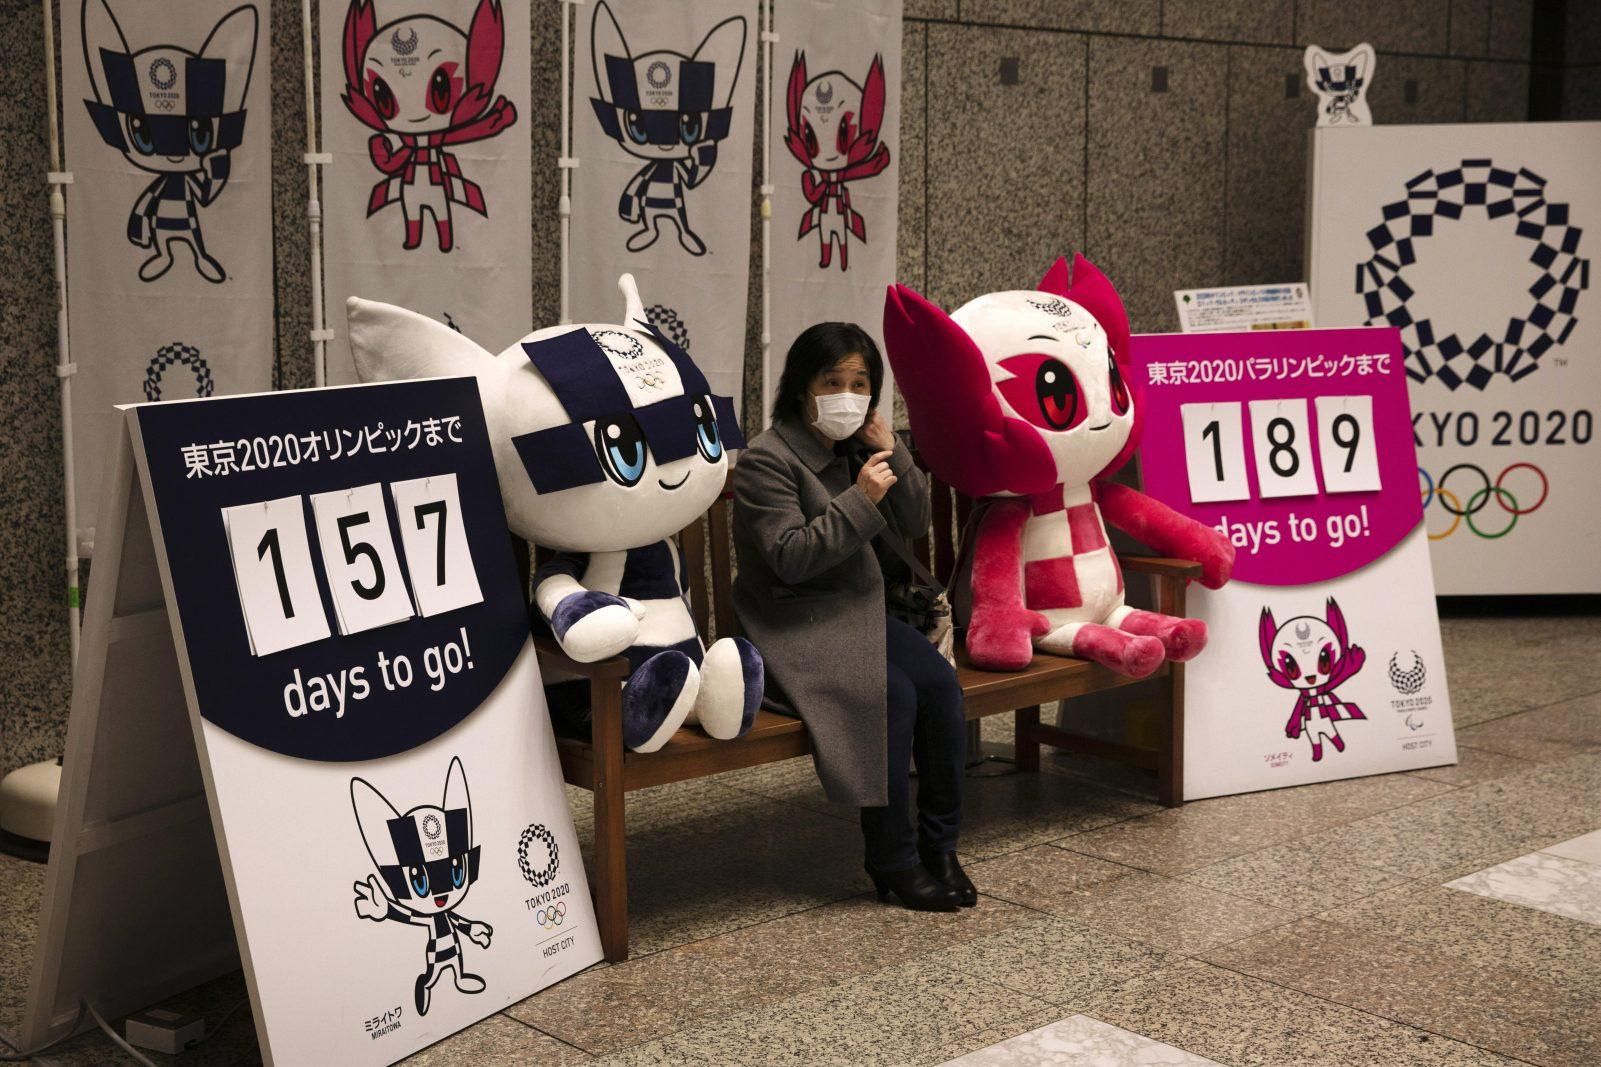 Tokyo Olympics IOC Dick Pound Coronavirus Japan Response1